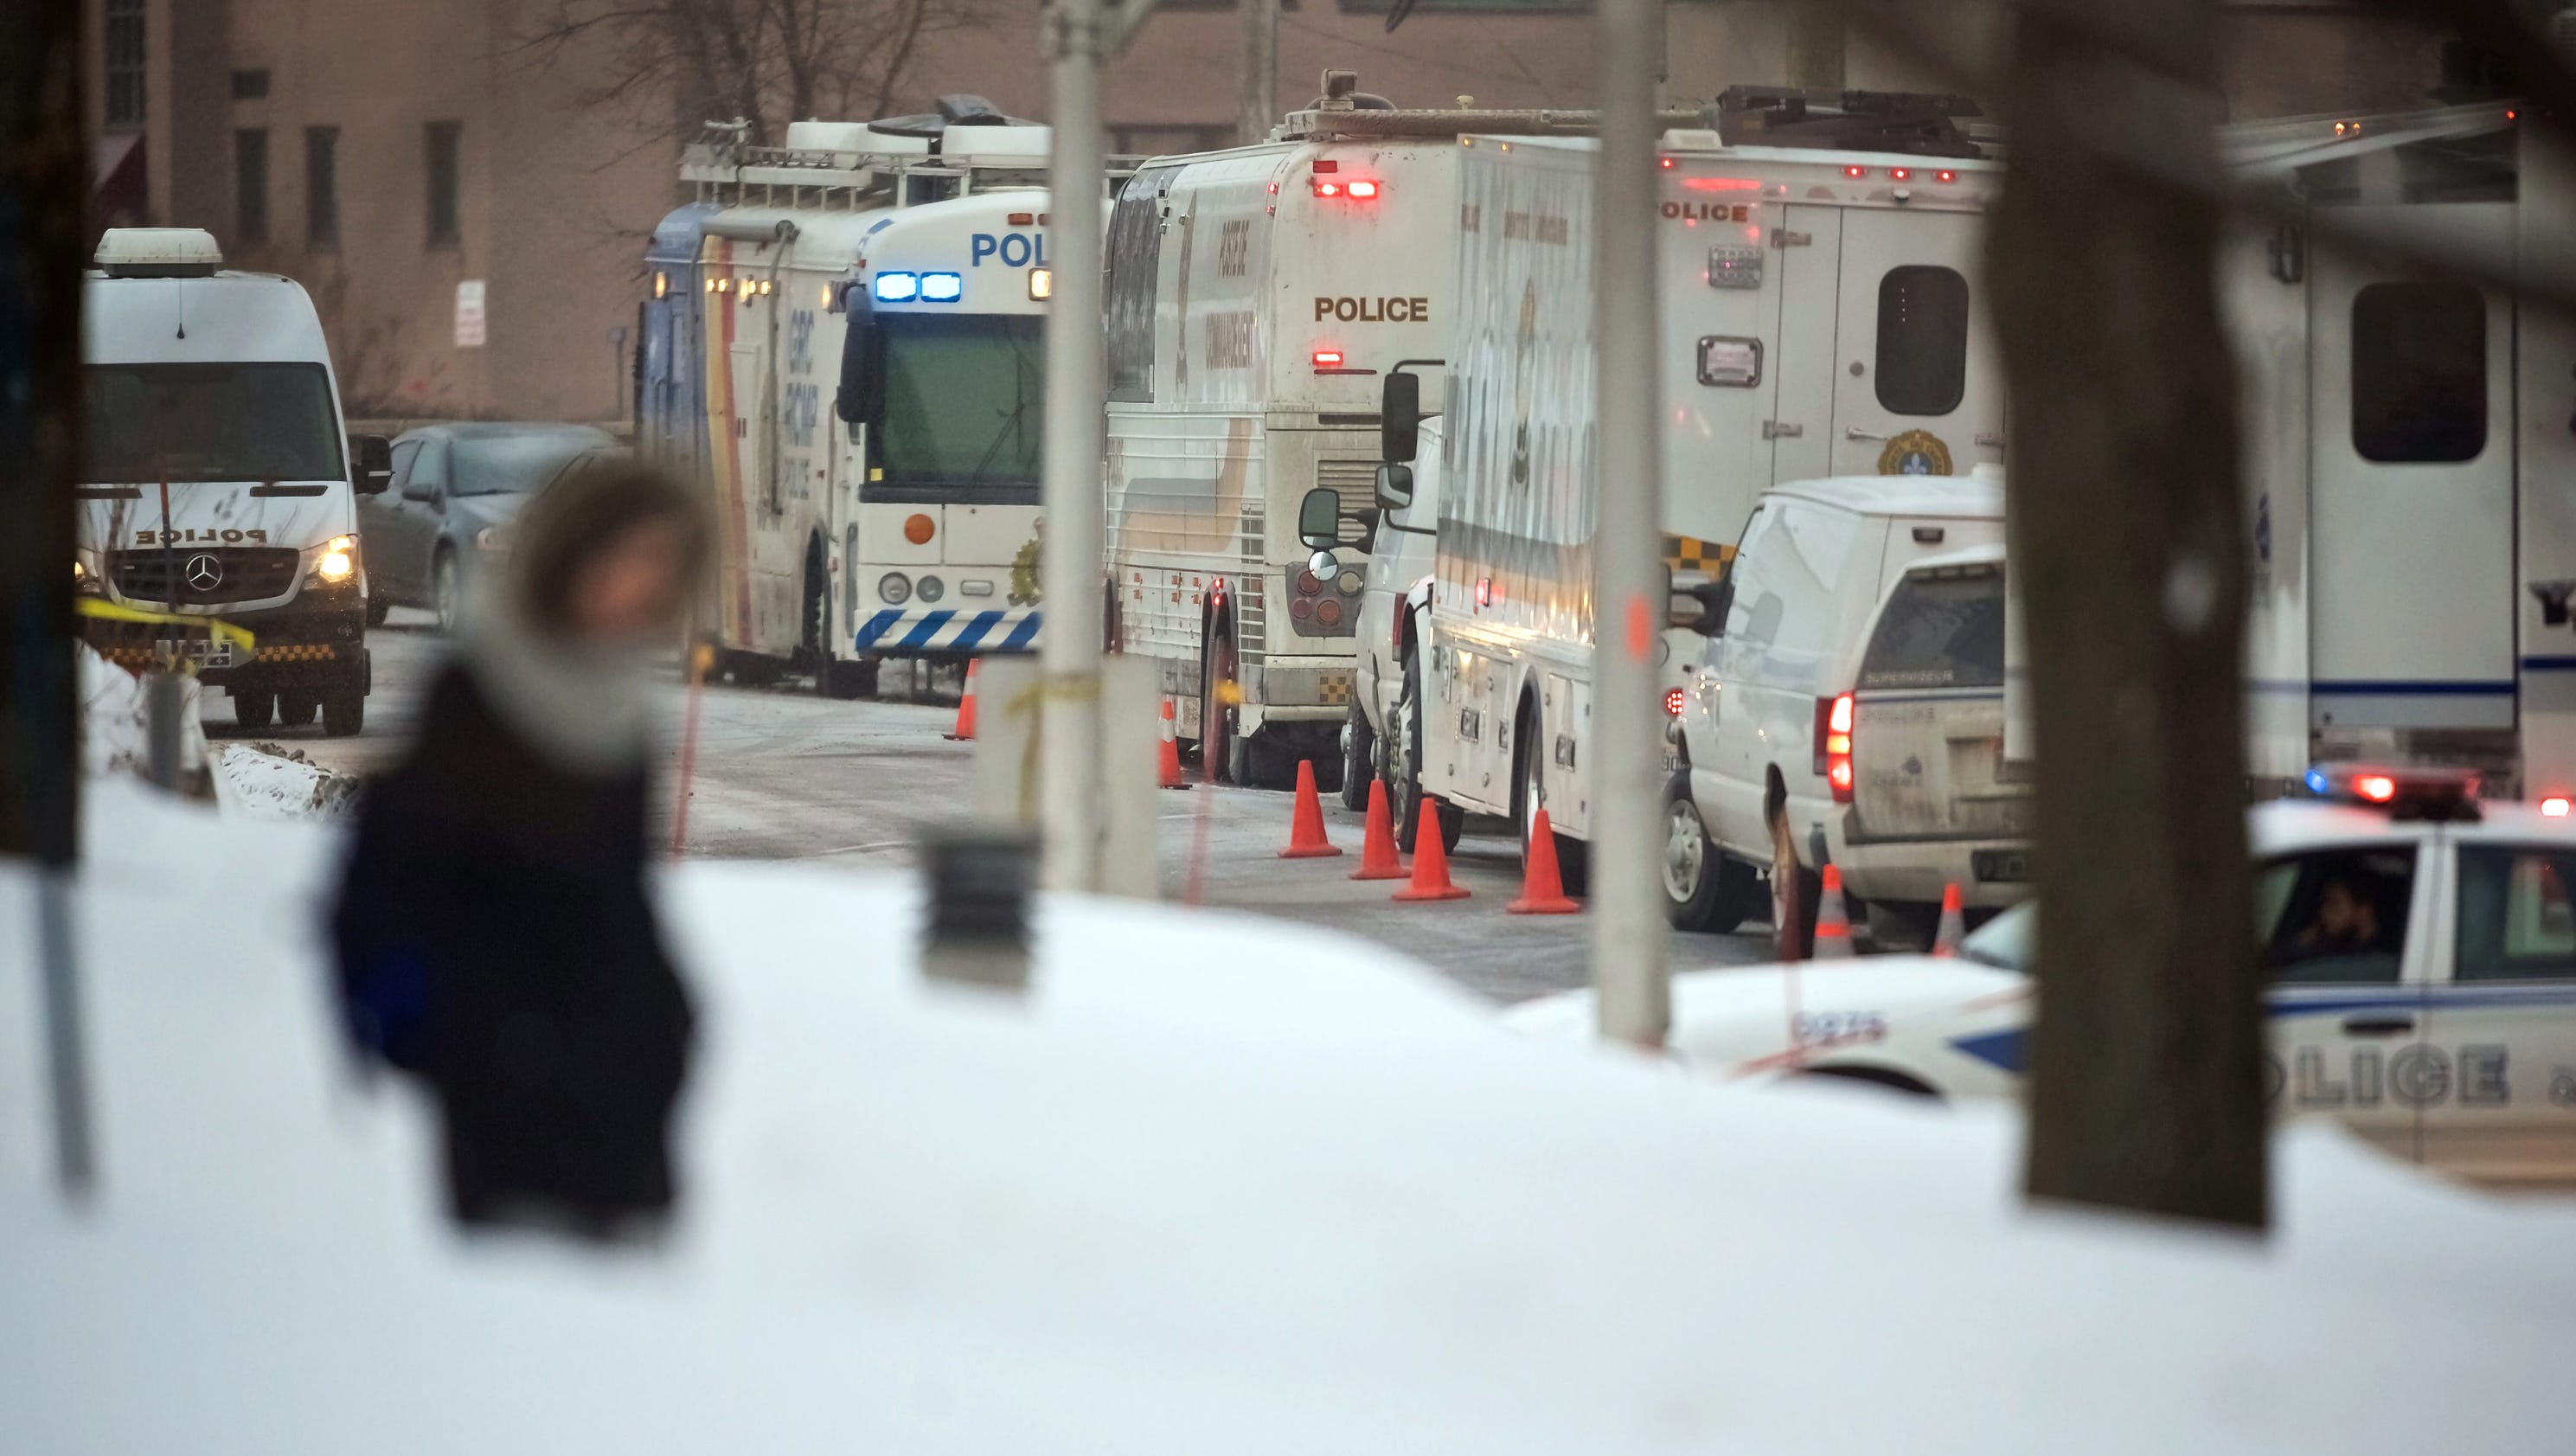 Mosque Shooting: Deadly Shooting At Quebec City Mosque